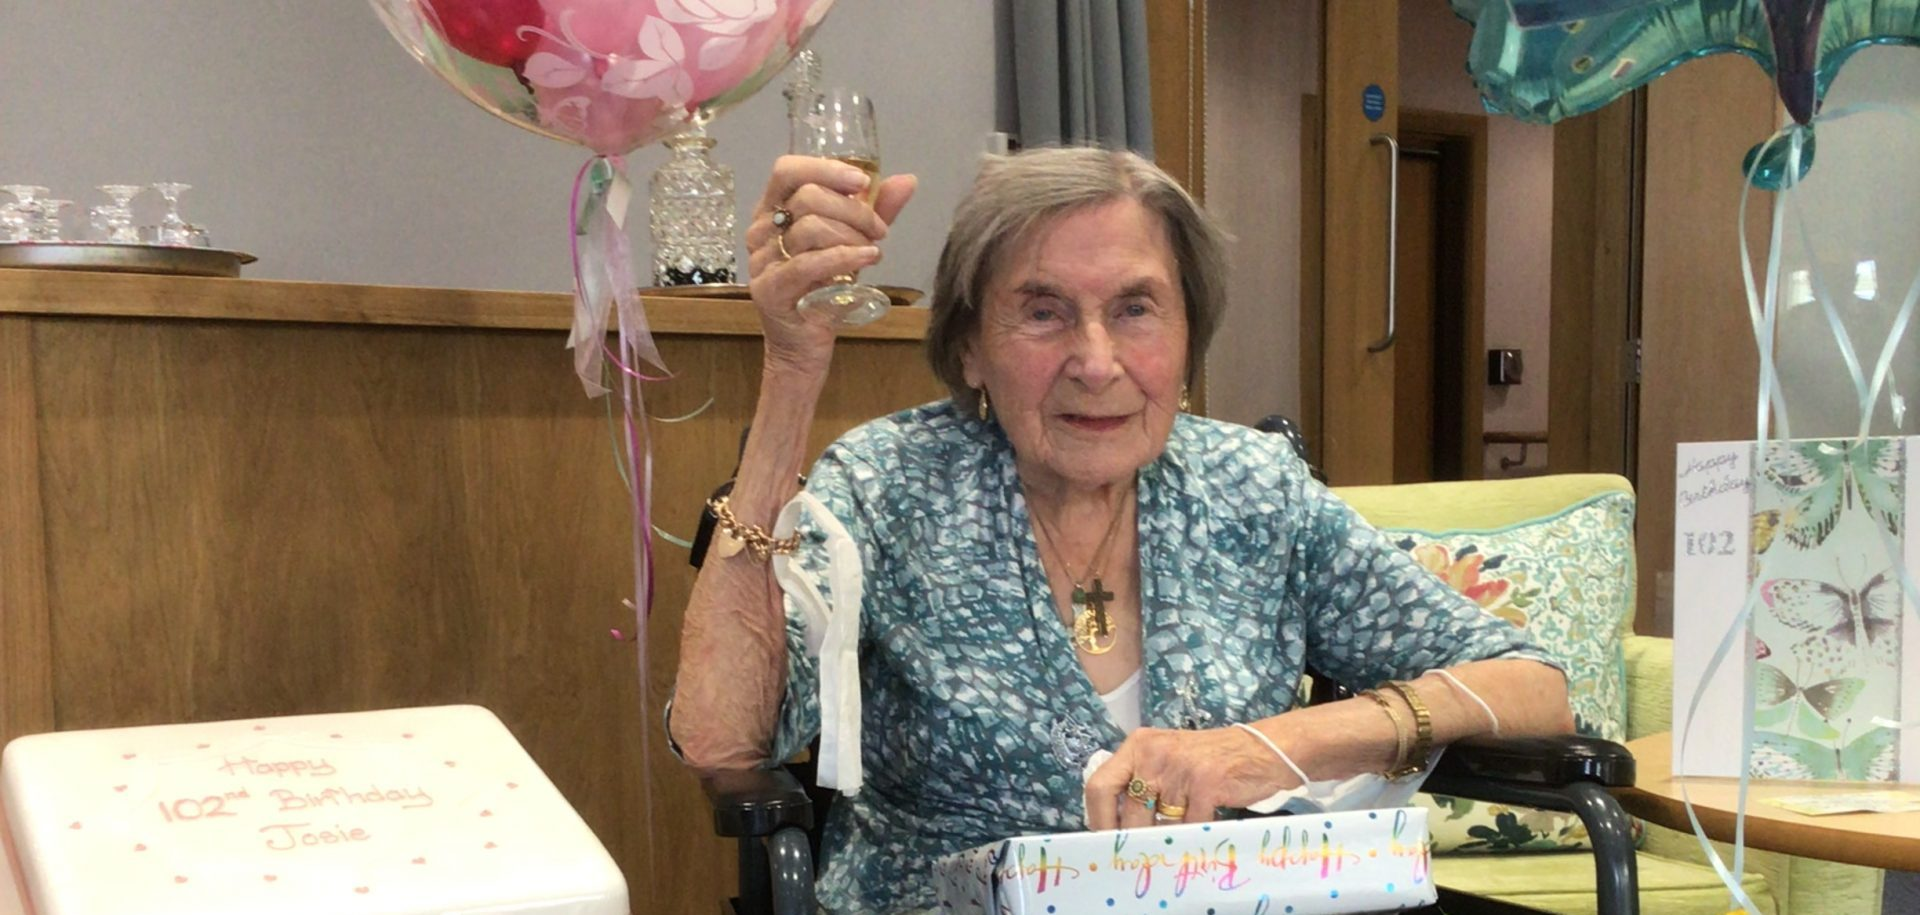 RMBI Home Connaught Court resident, Josie Kirk, celebrates her 102nd birthday.